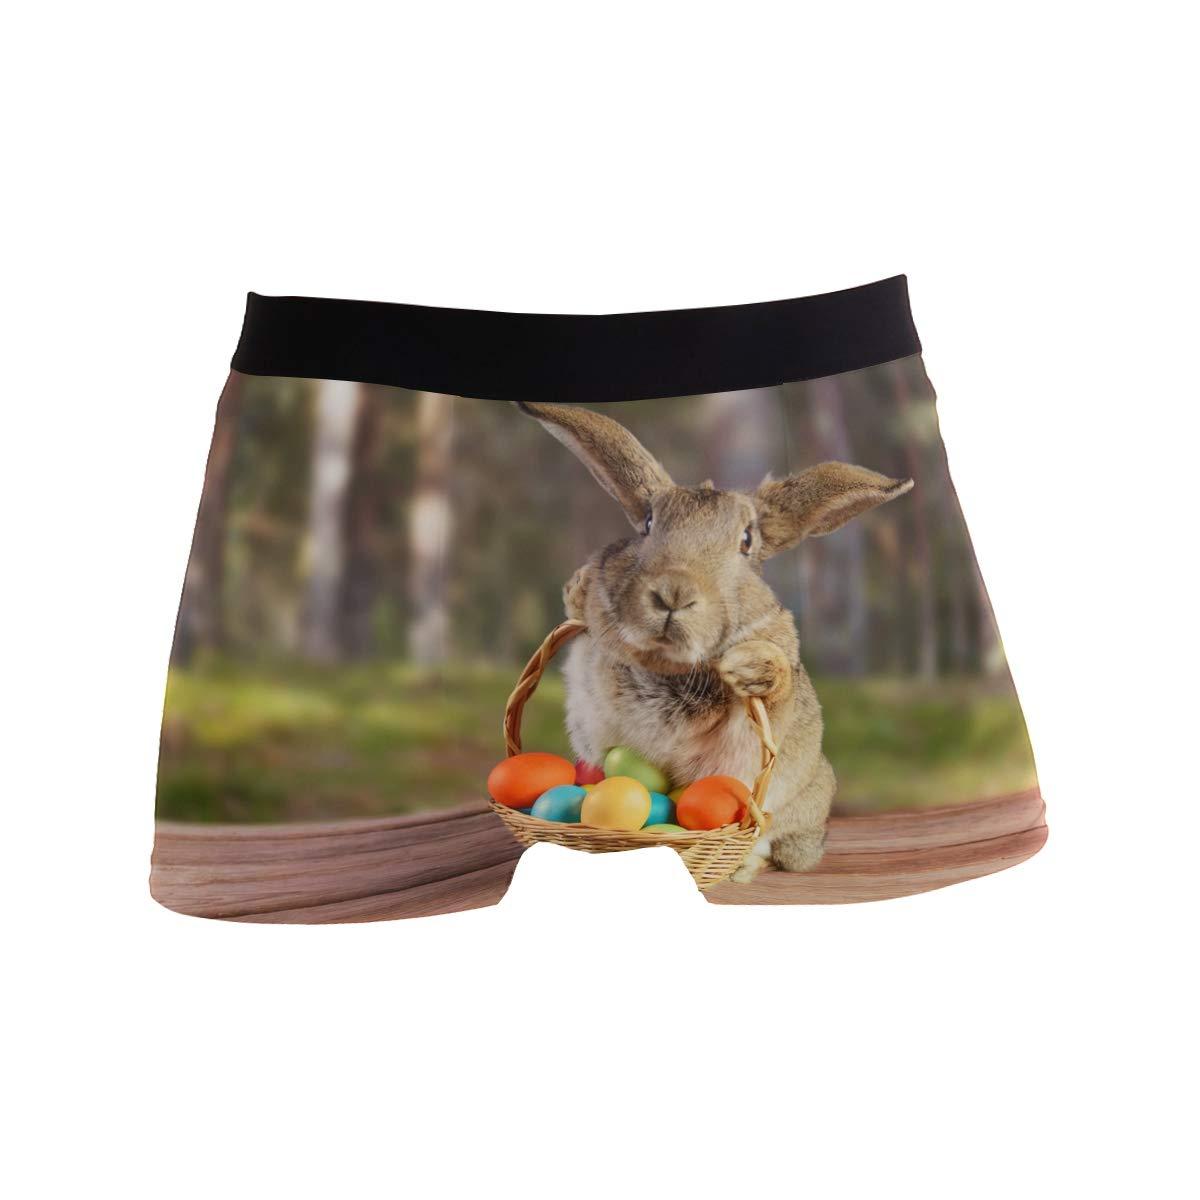 Rabbit Easter Eggs Mens Underwear Soft Polyester Boxer Brief for Men Adult Teen Children Kids S